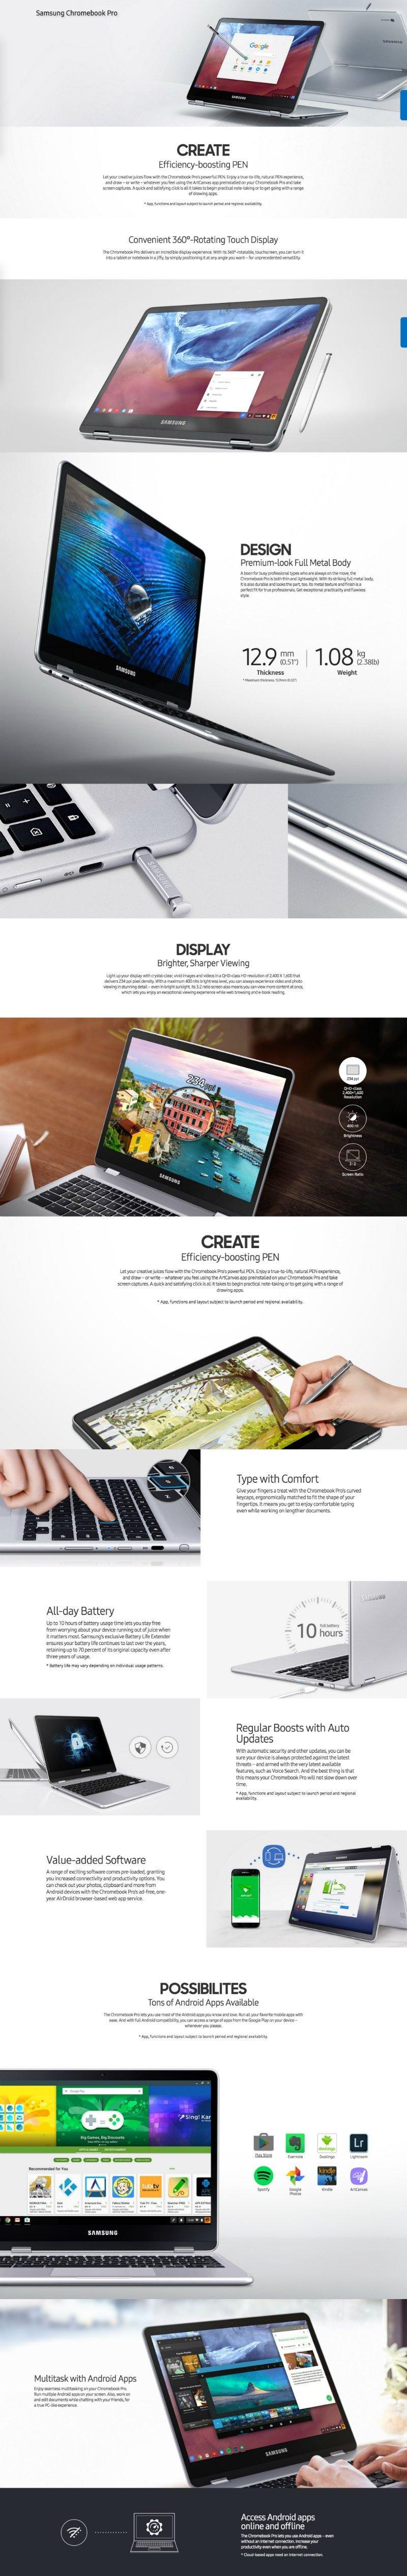 SamsungChrombookProPage